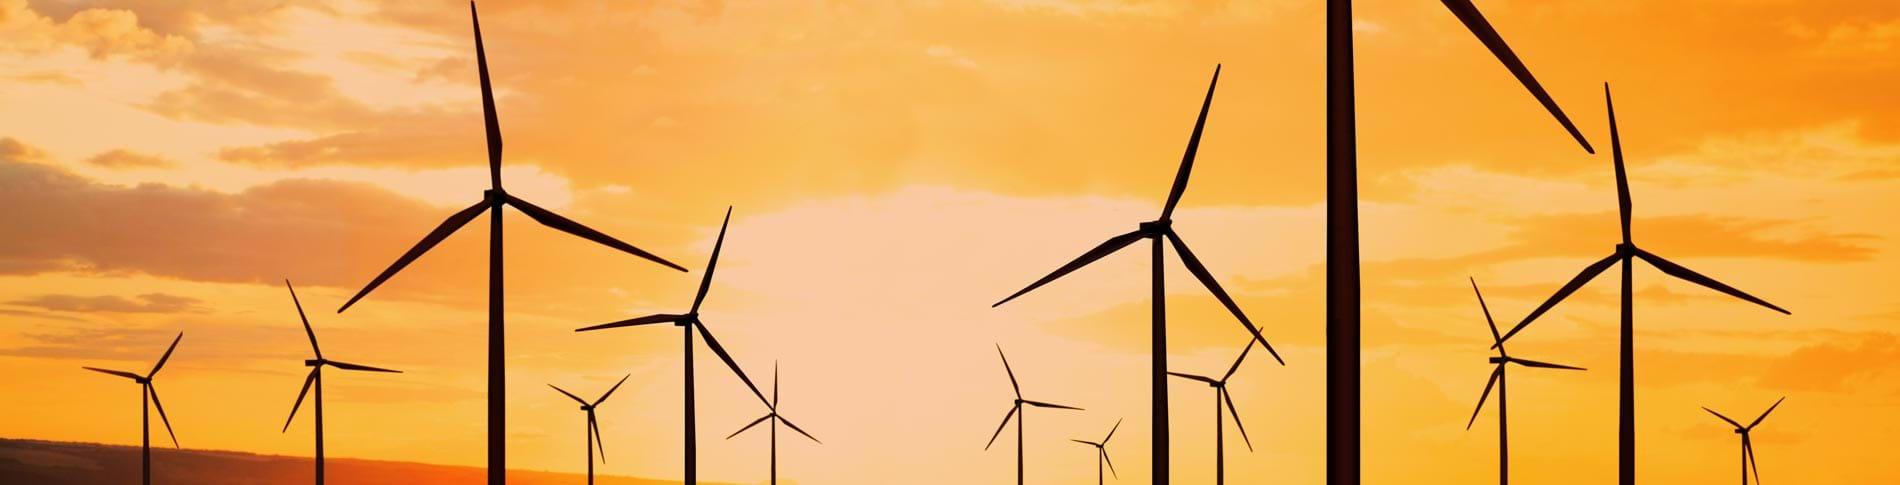 Eland Cables - Renewable Energy cables